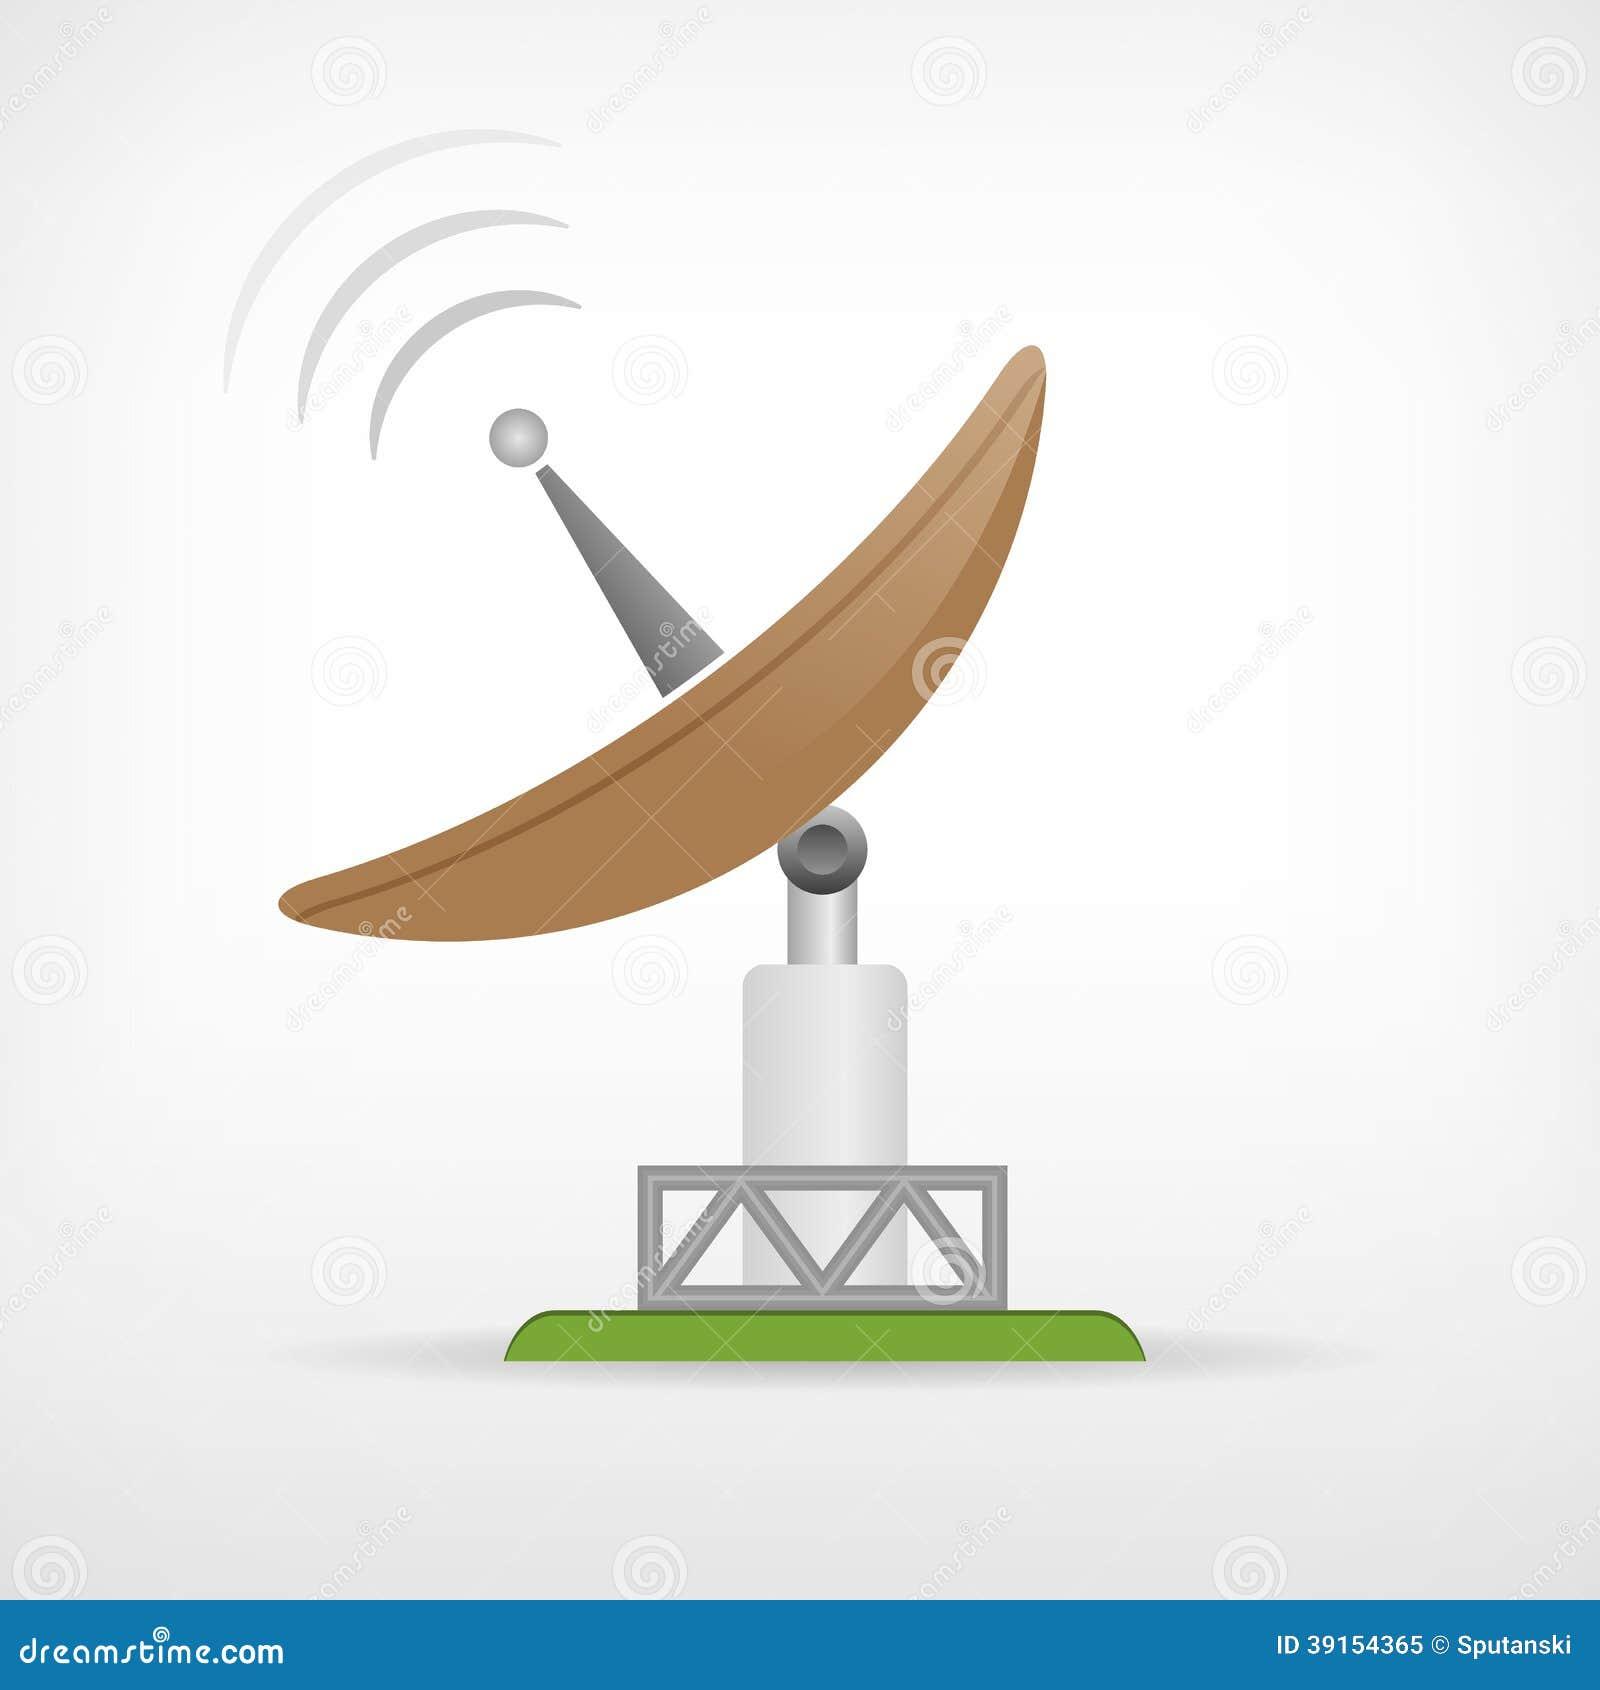 Satellite communication textbooks